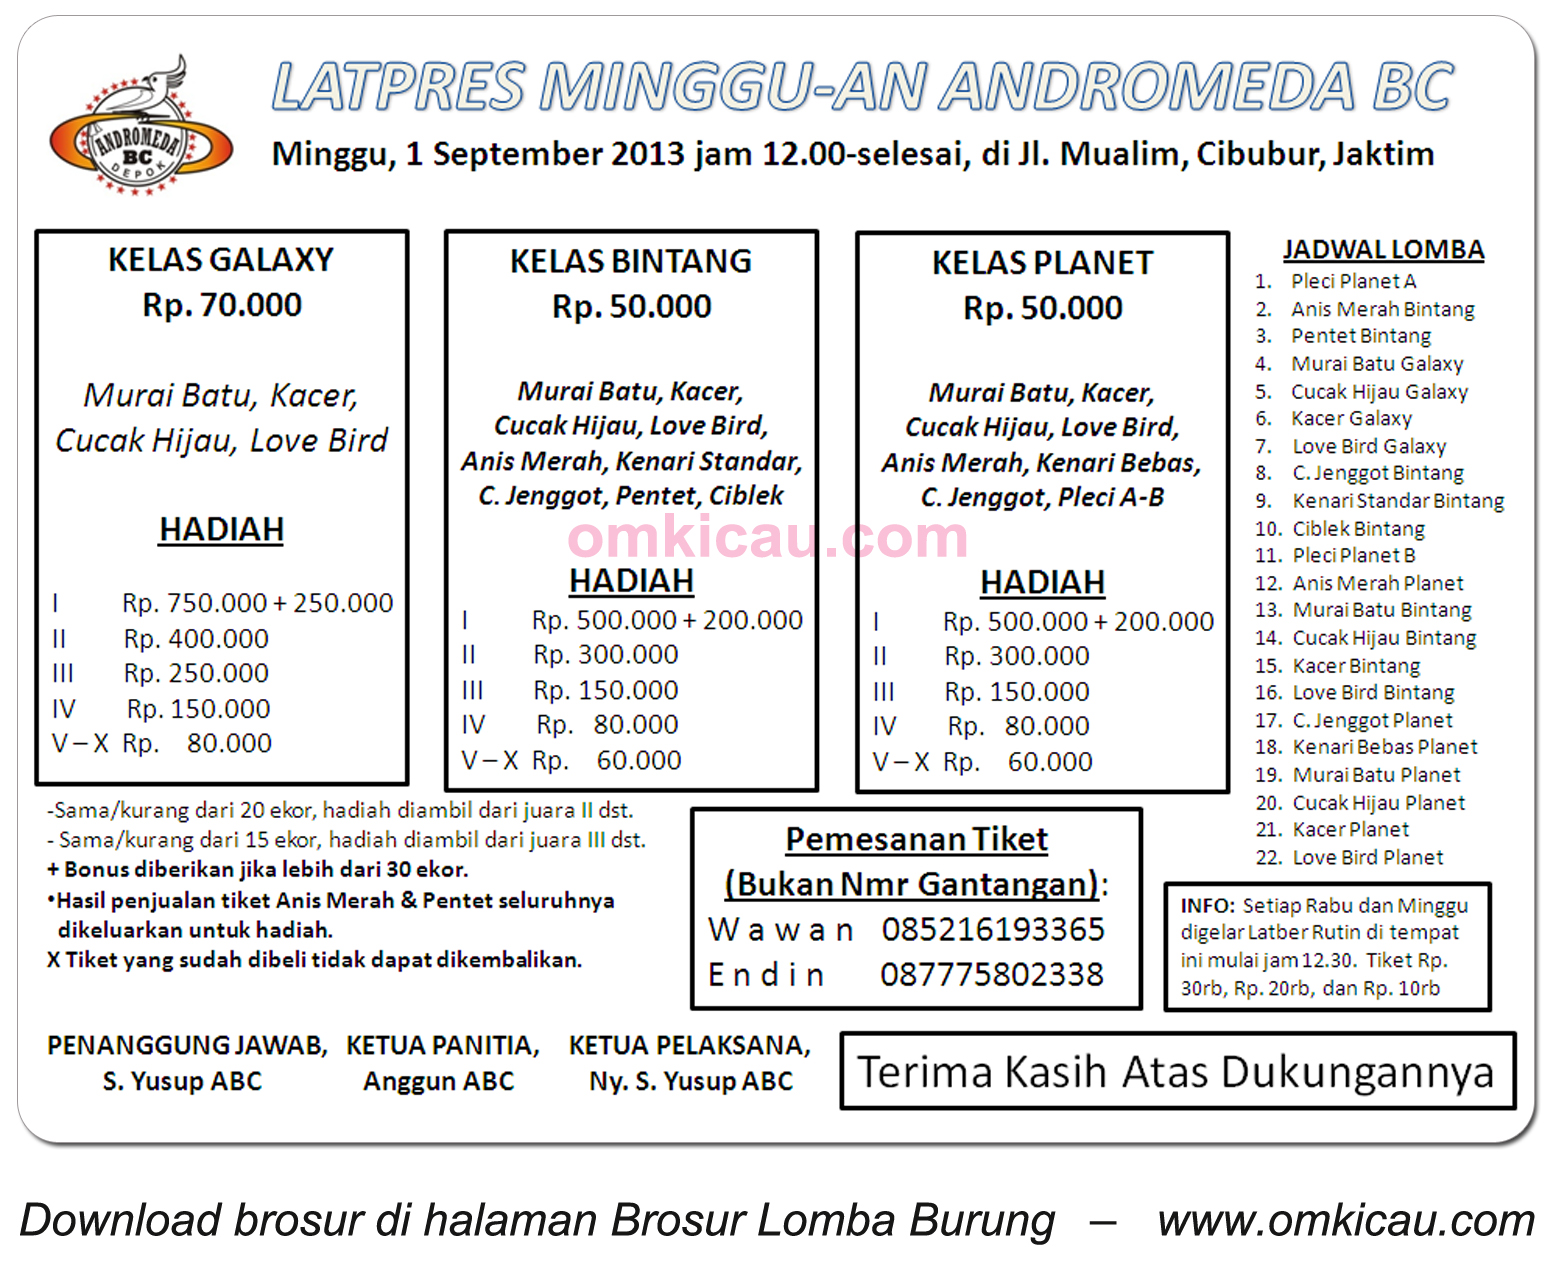 Brosur Latpres Andromeda BC Jakarta 1 Sept 2013